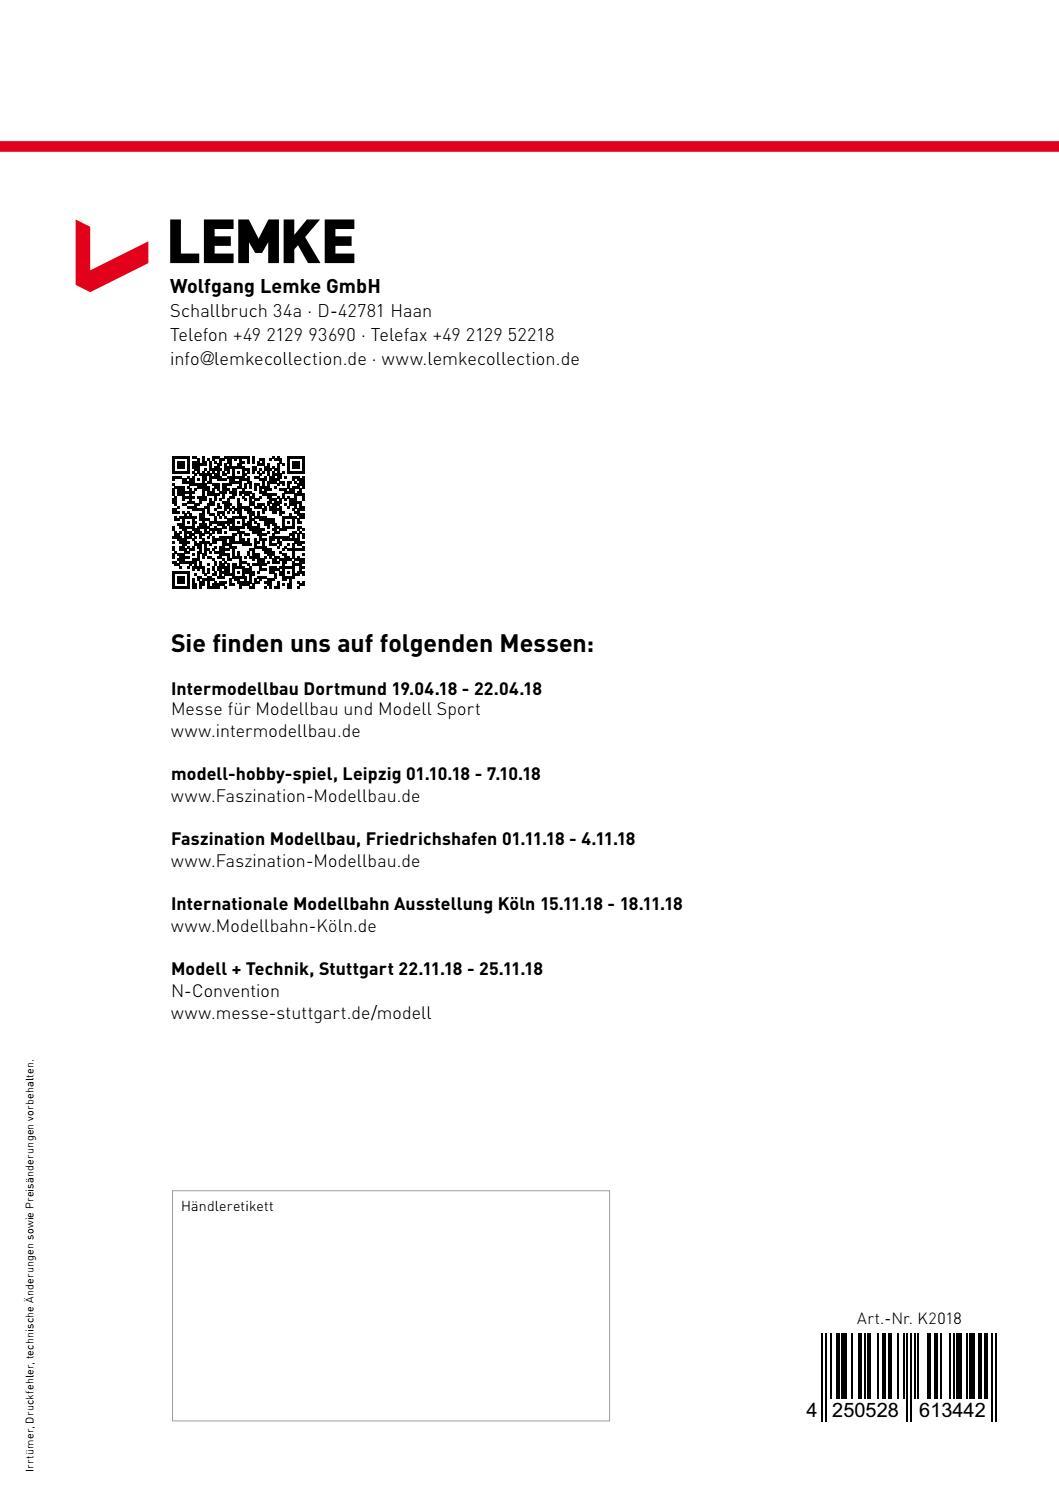 Lemke K2018 Katalog 2018